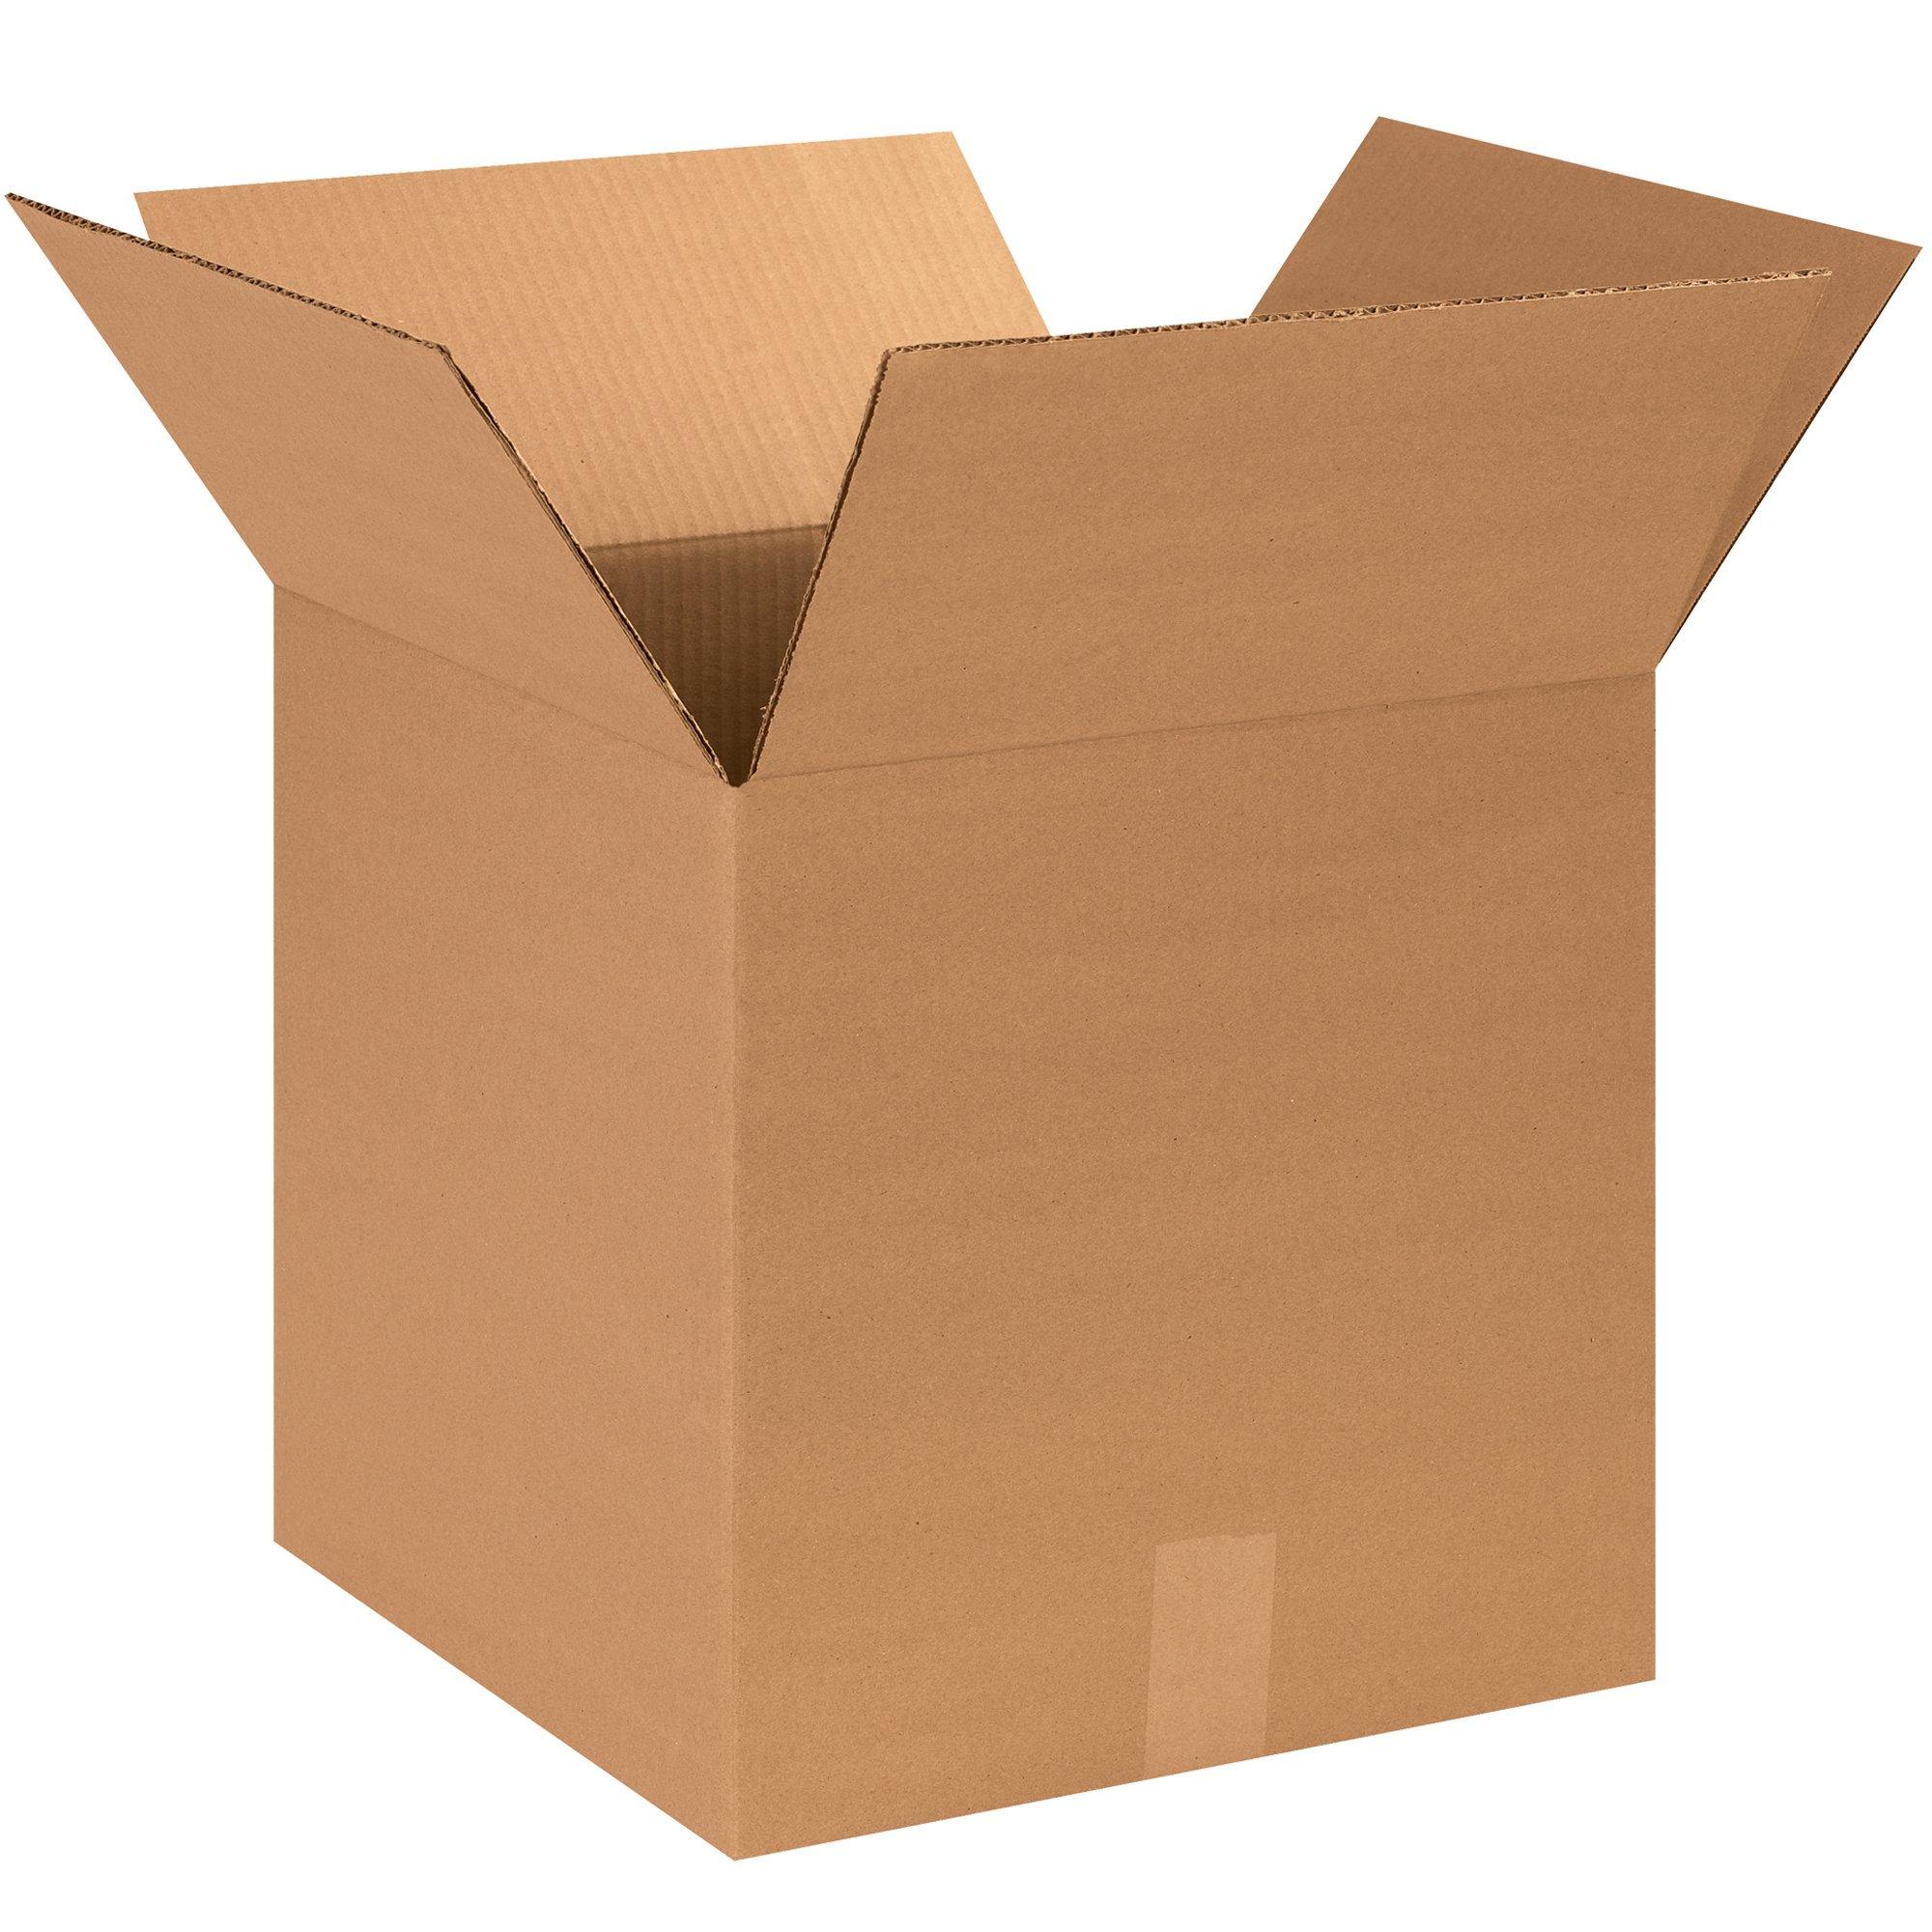 BOX USA B141414500PK Corrugated Boxes, 14''L x 14''W x 14''H, Kraft (Pack of 500)